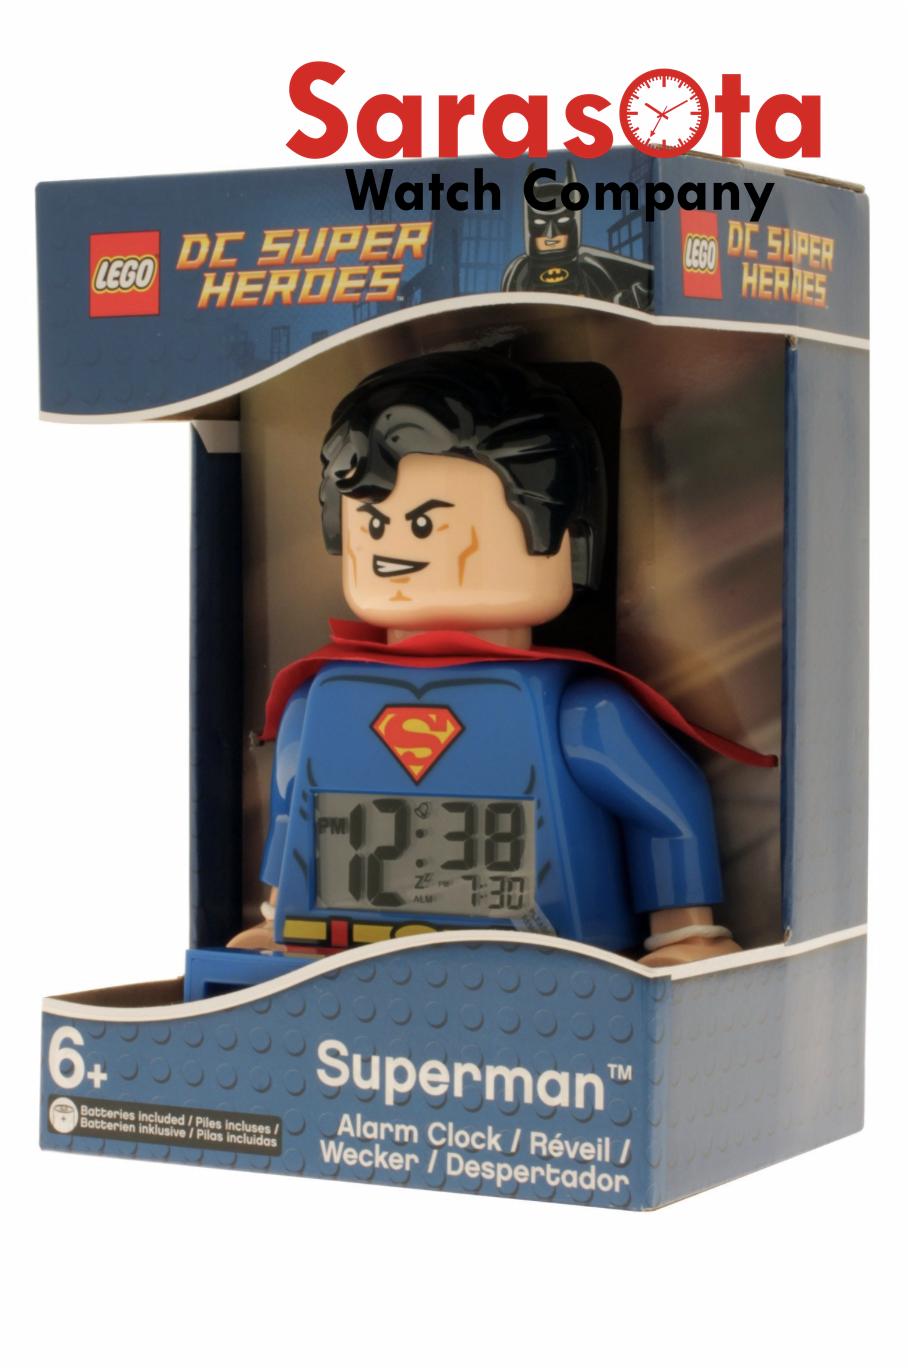 SUPERMAN w// Red Belt Minifigure ~ Lego ~ DC Super Heroes ~ MINT~